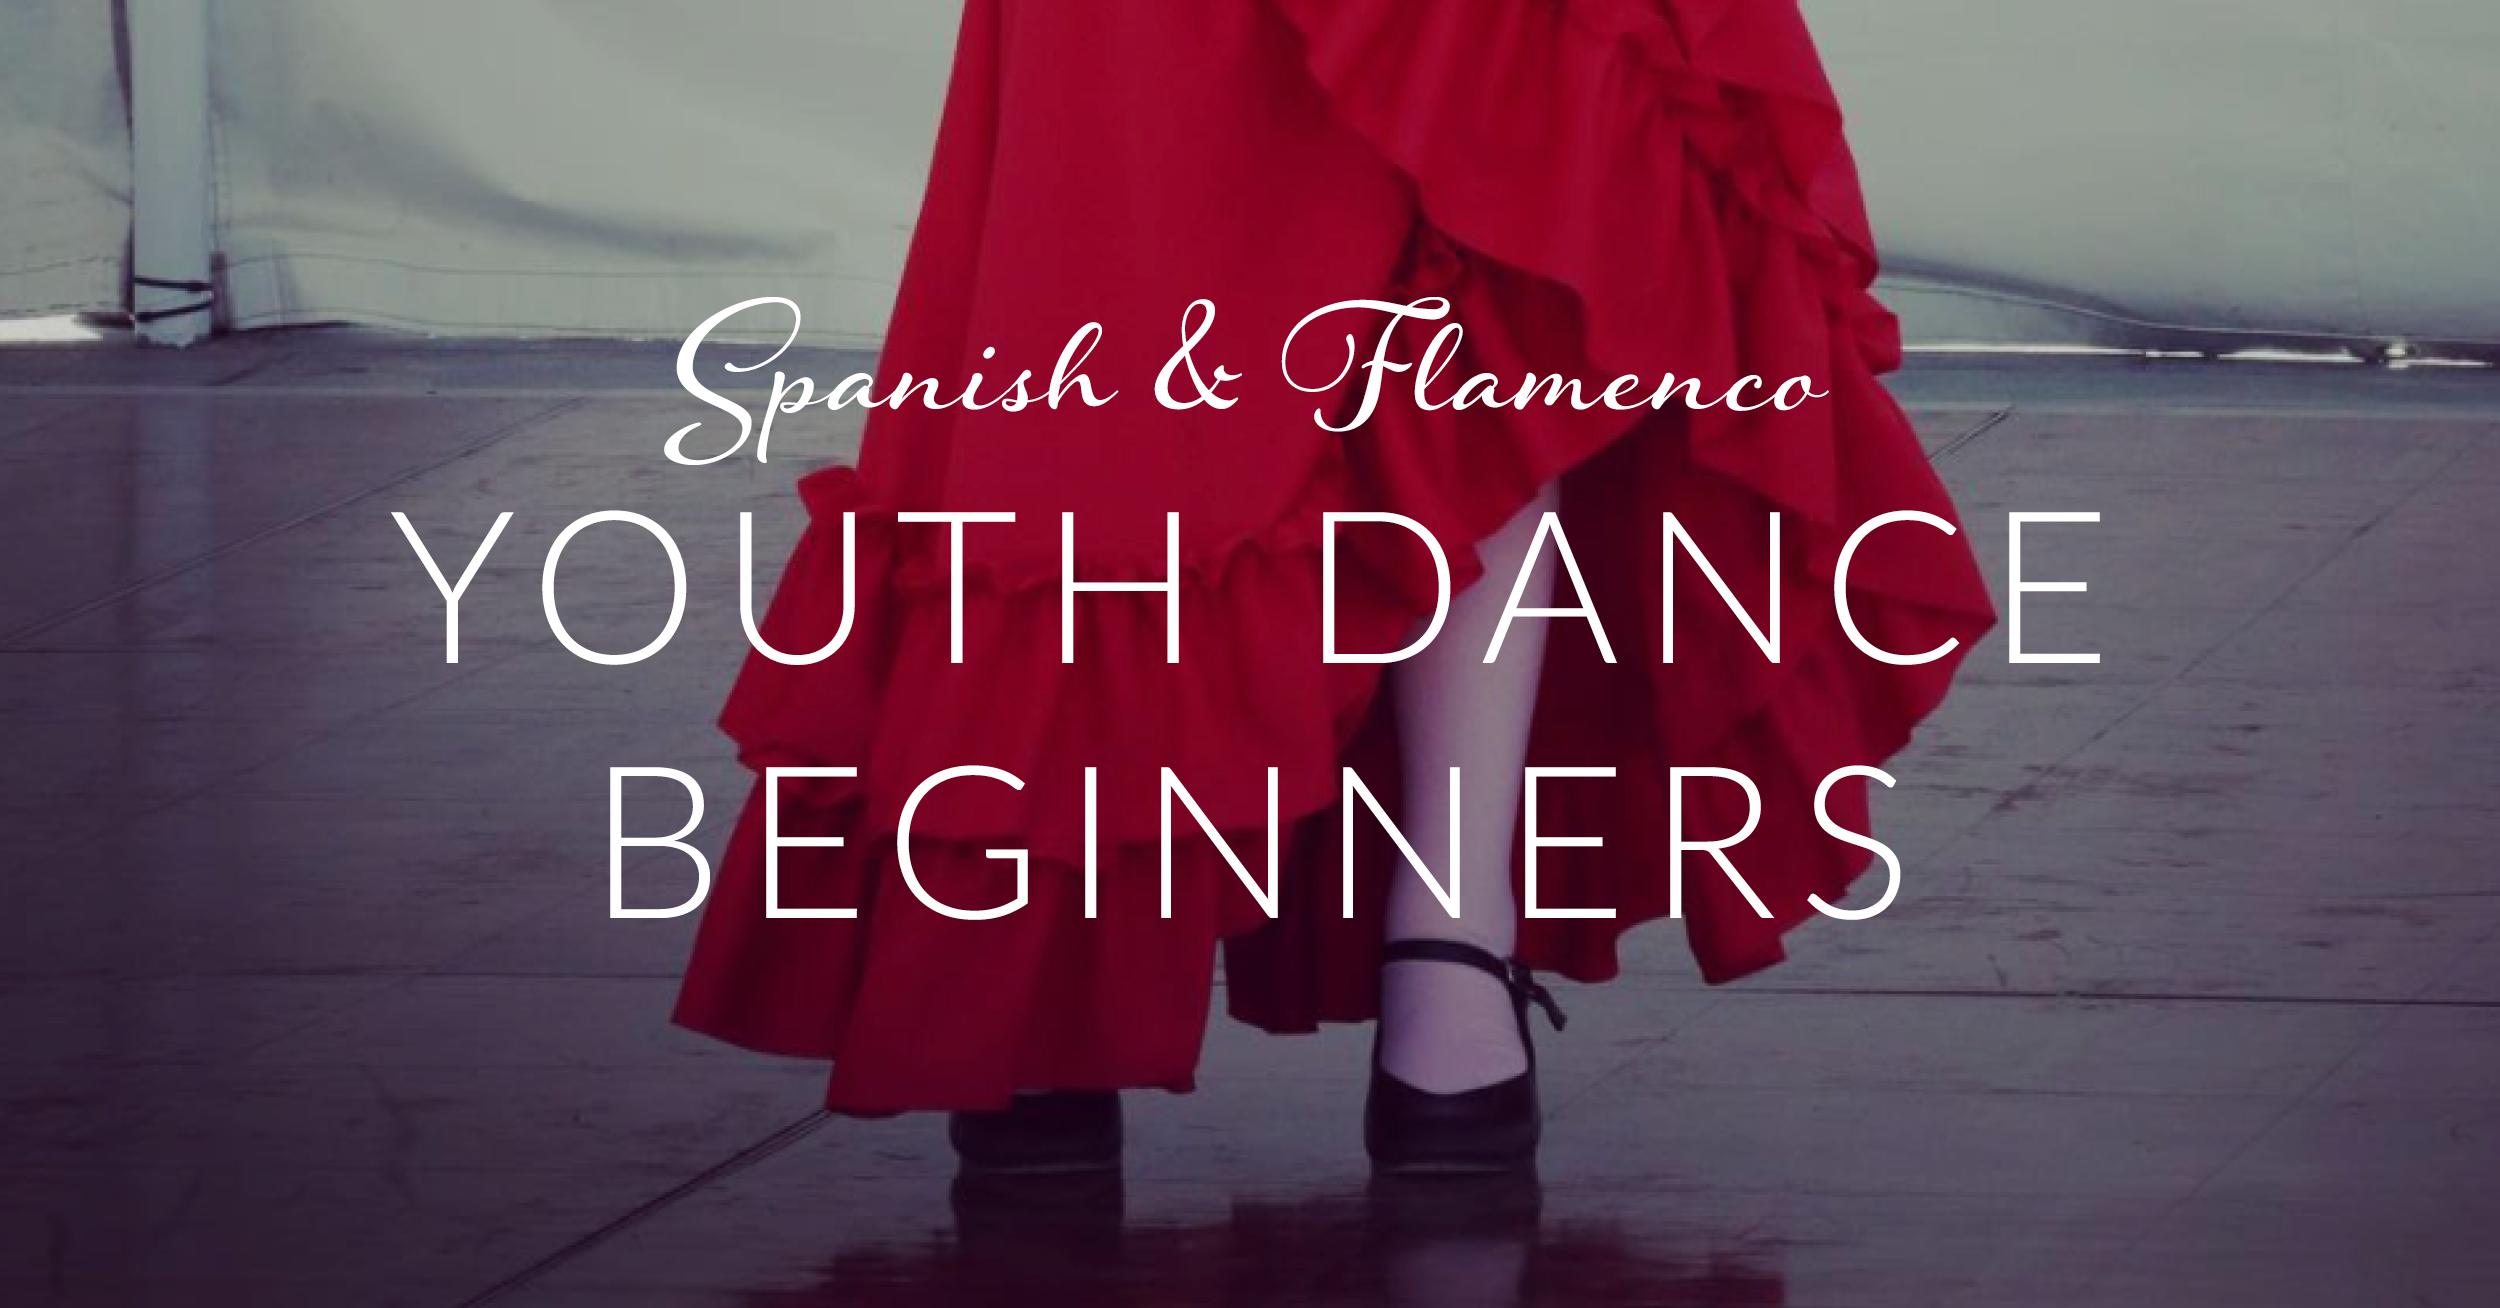 Laviva Flamenco.png